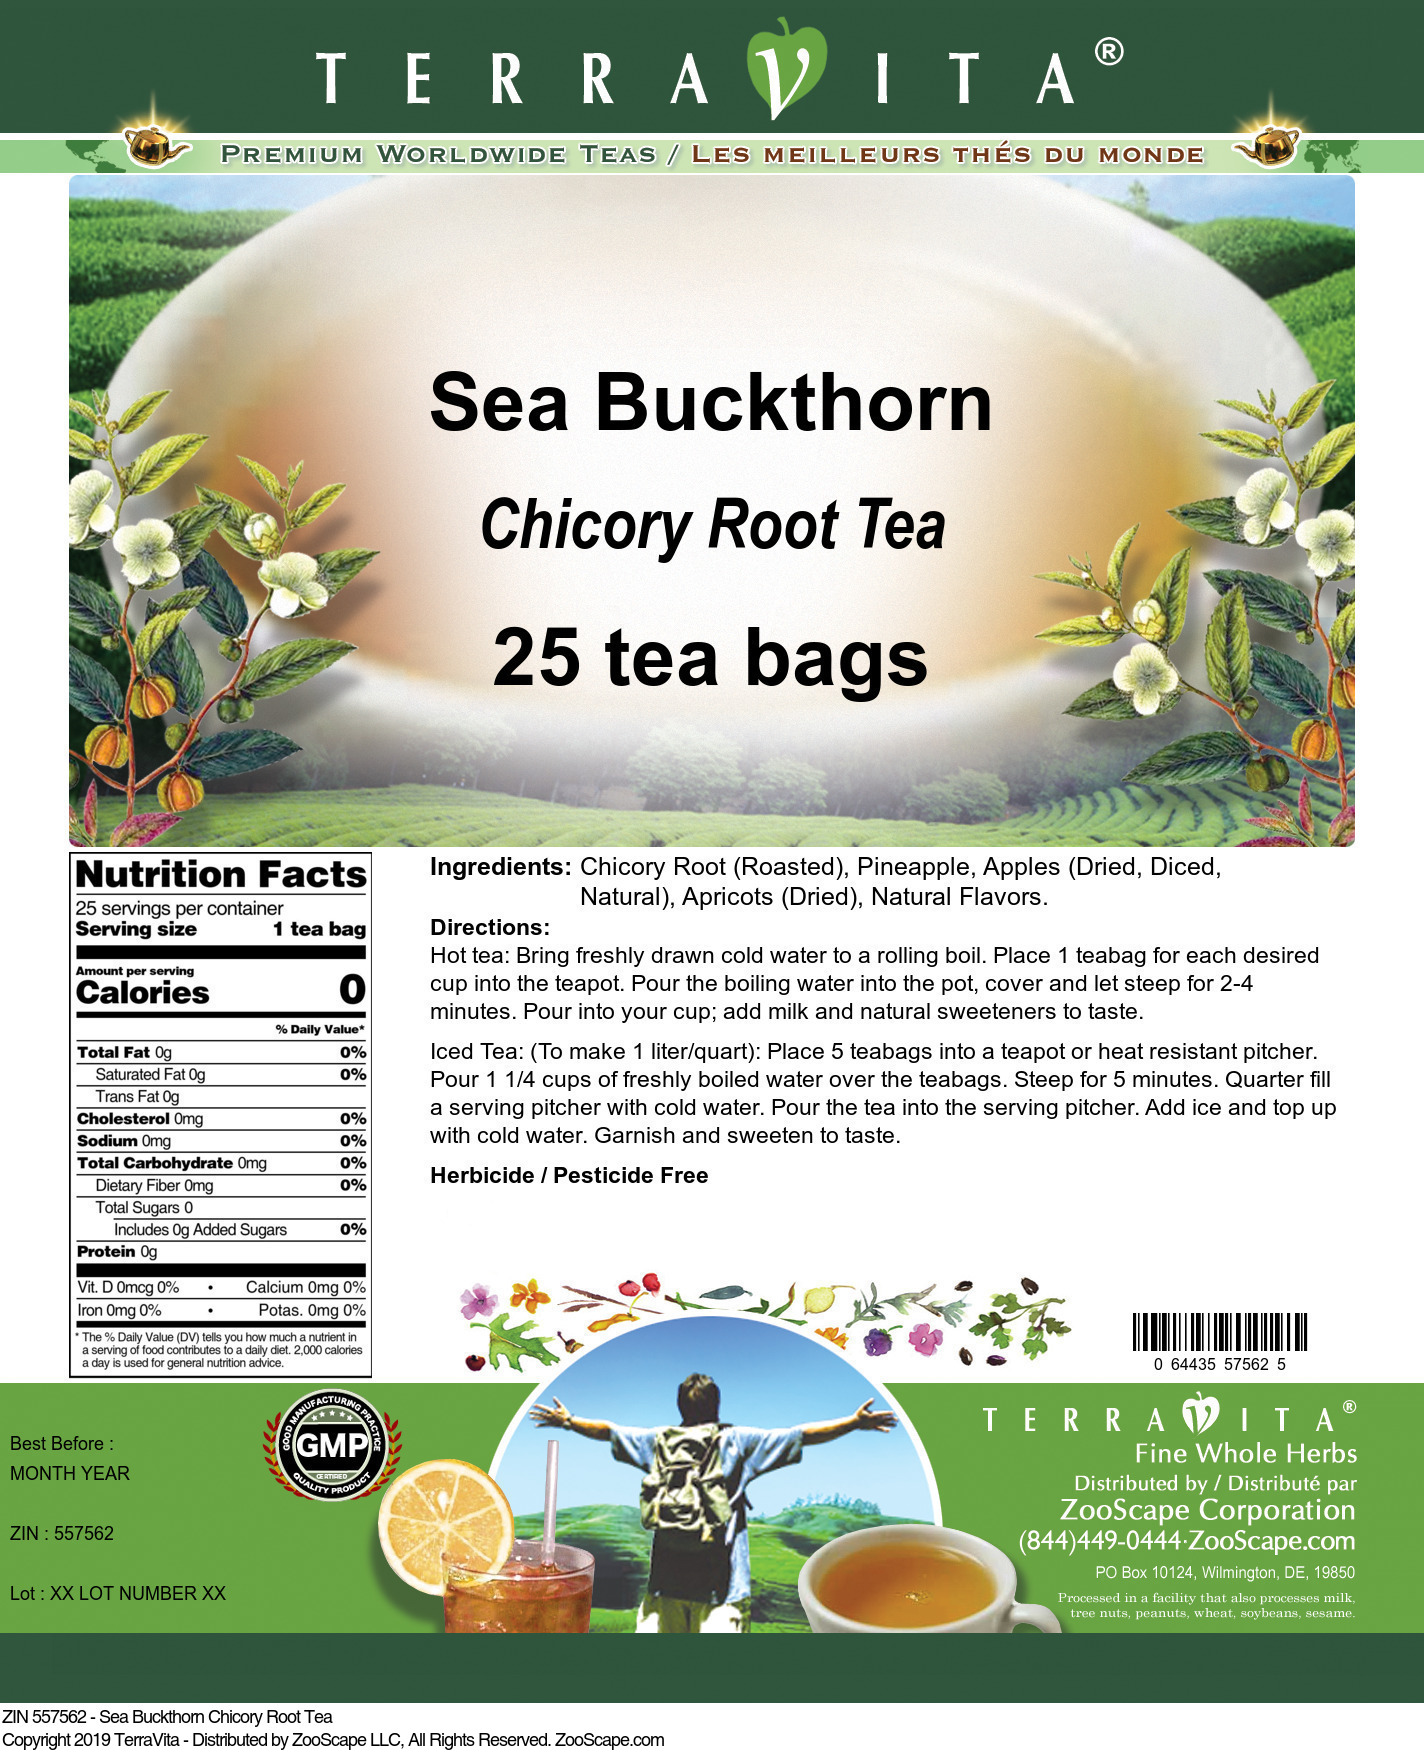 Sea Buckthorn Chicory Root